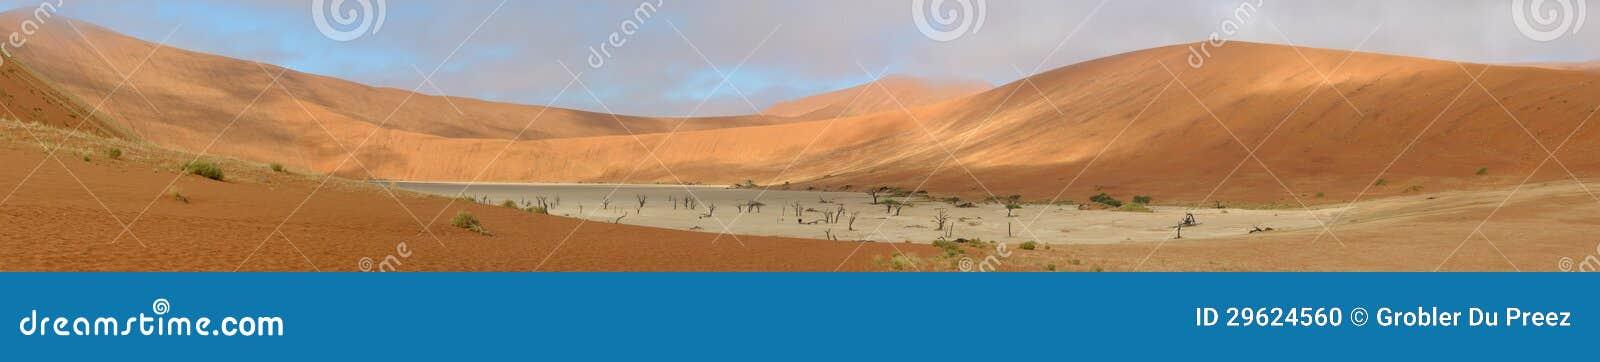 Deadvlei panorama 8